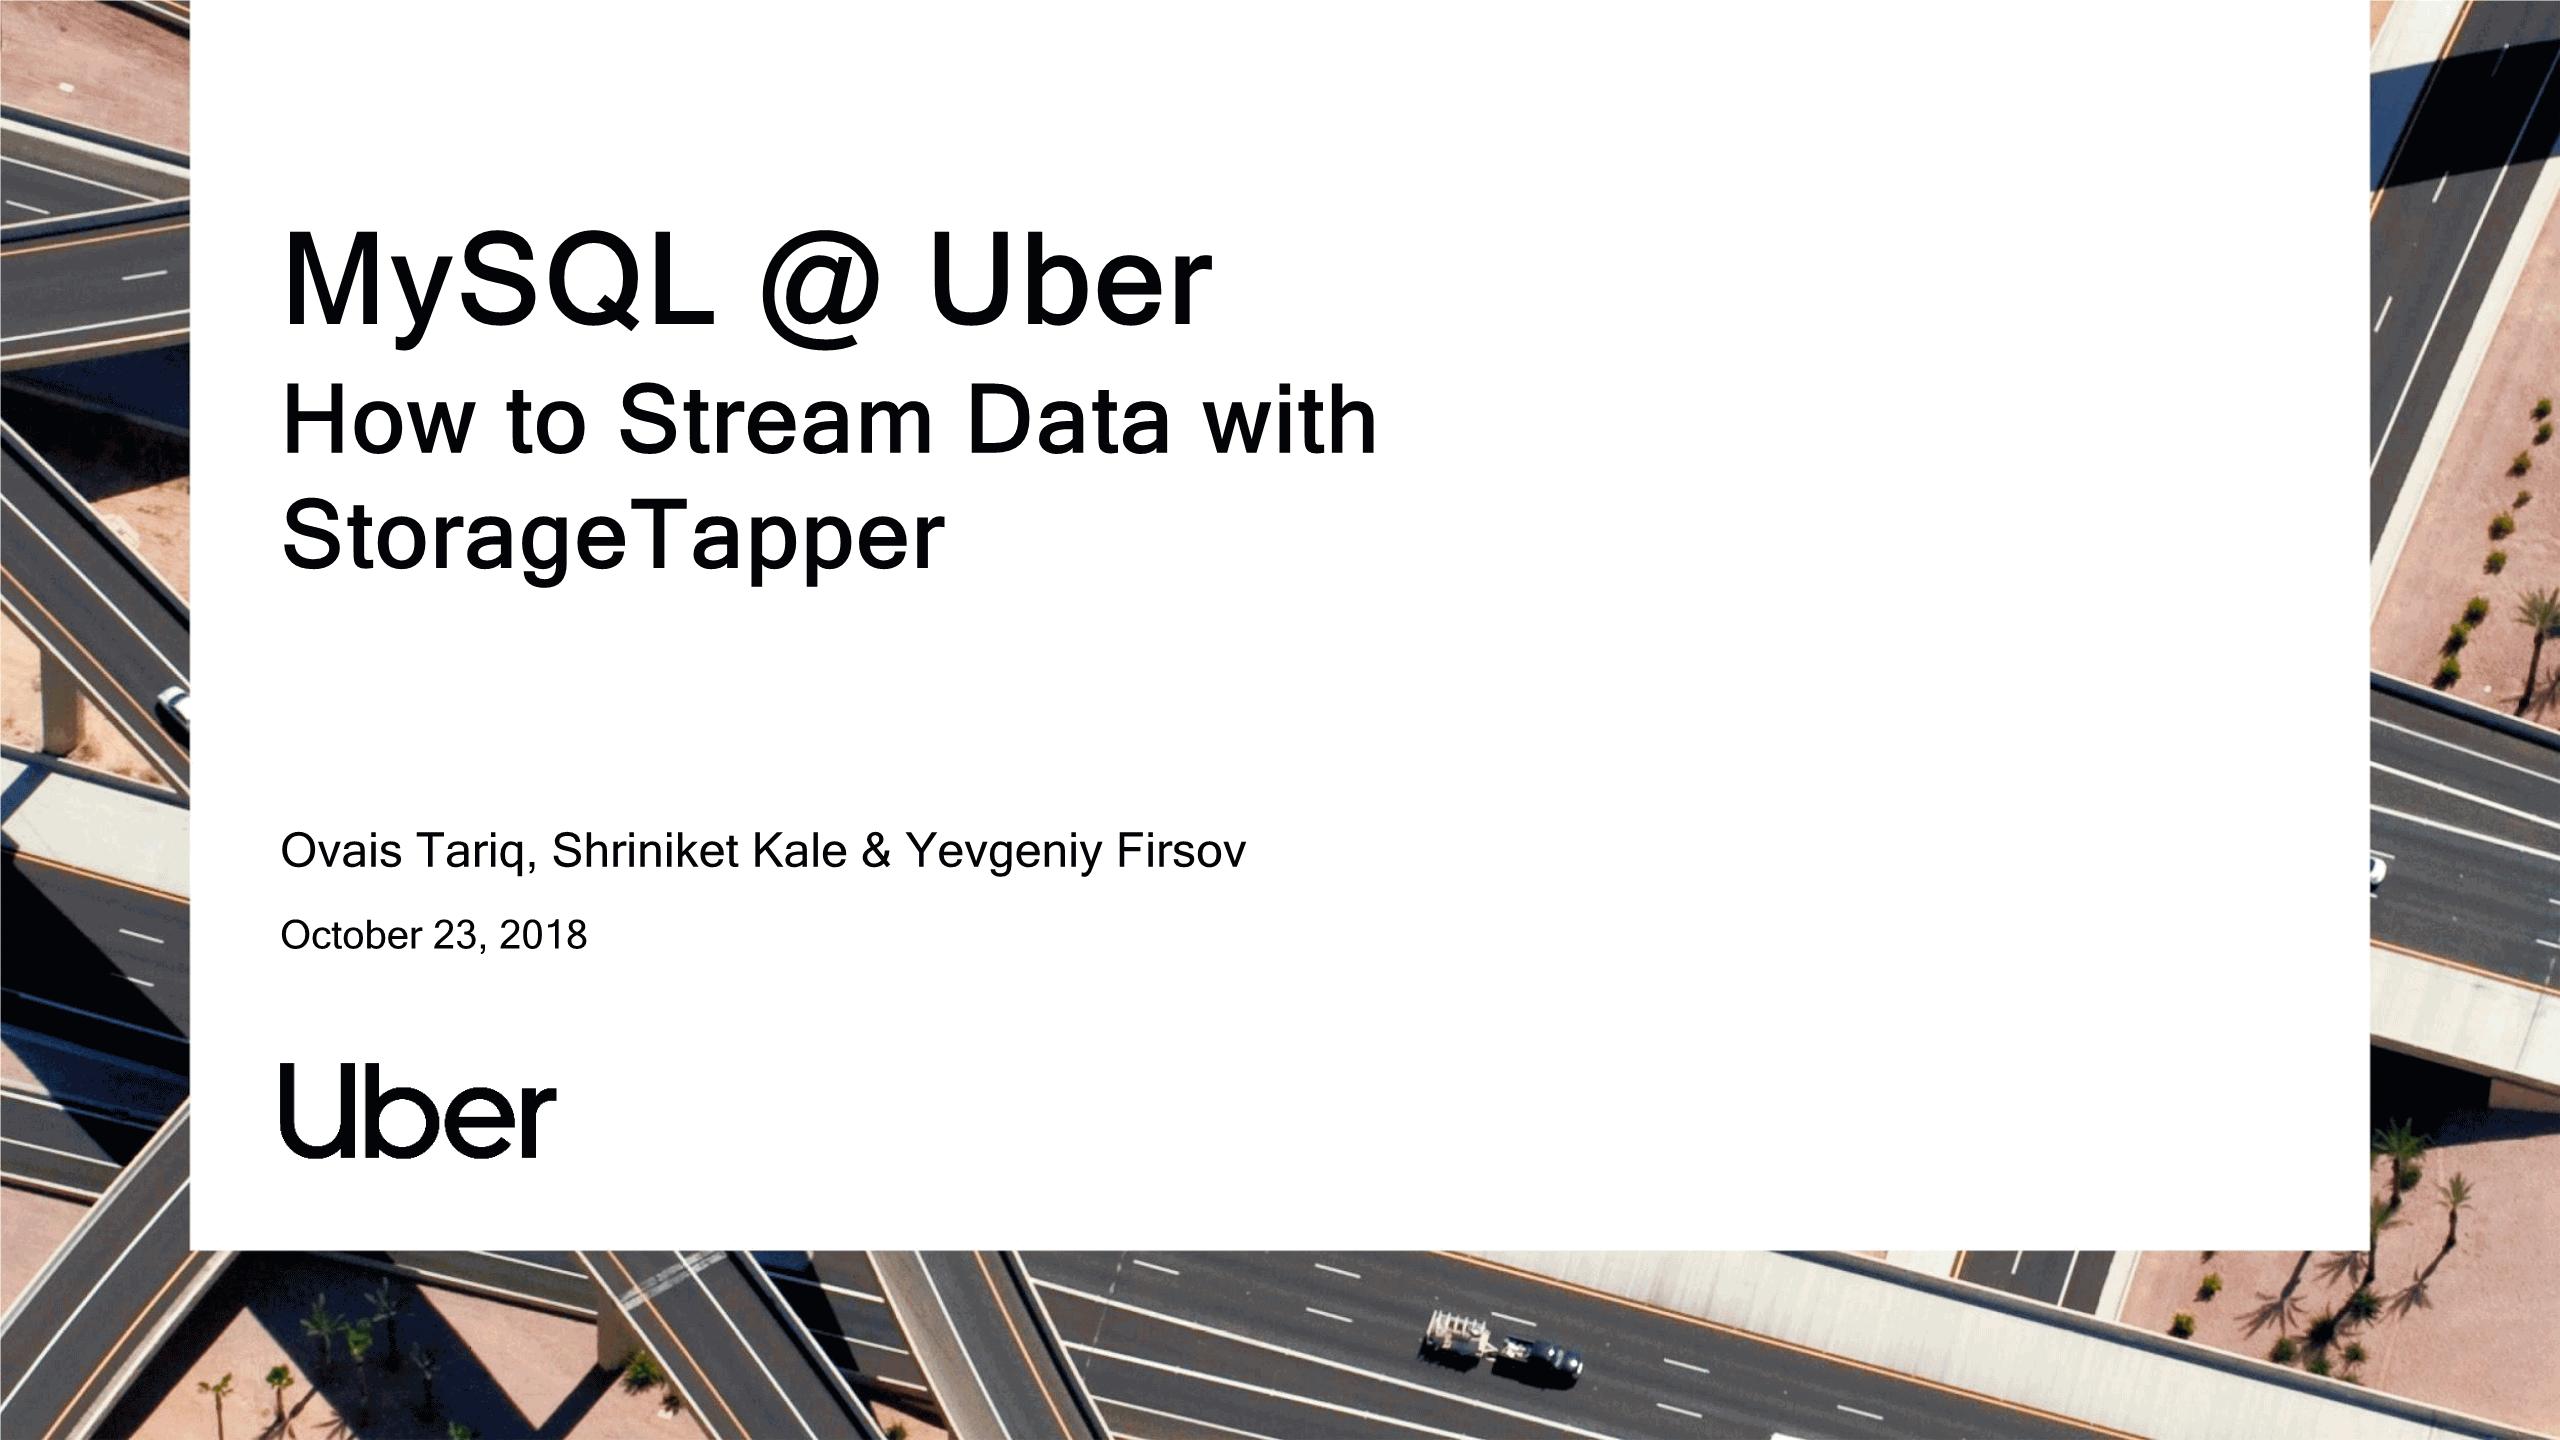 Ovais Tariq-How to Stream Data with StorageTapper